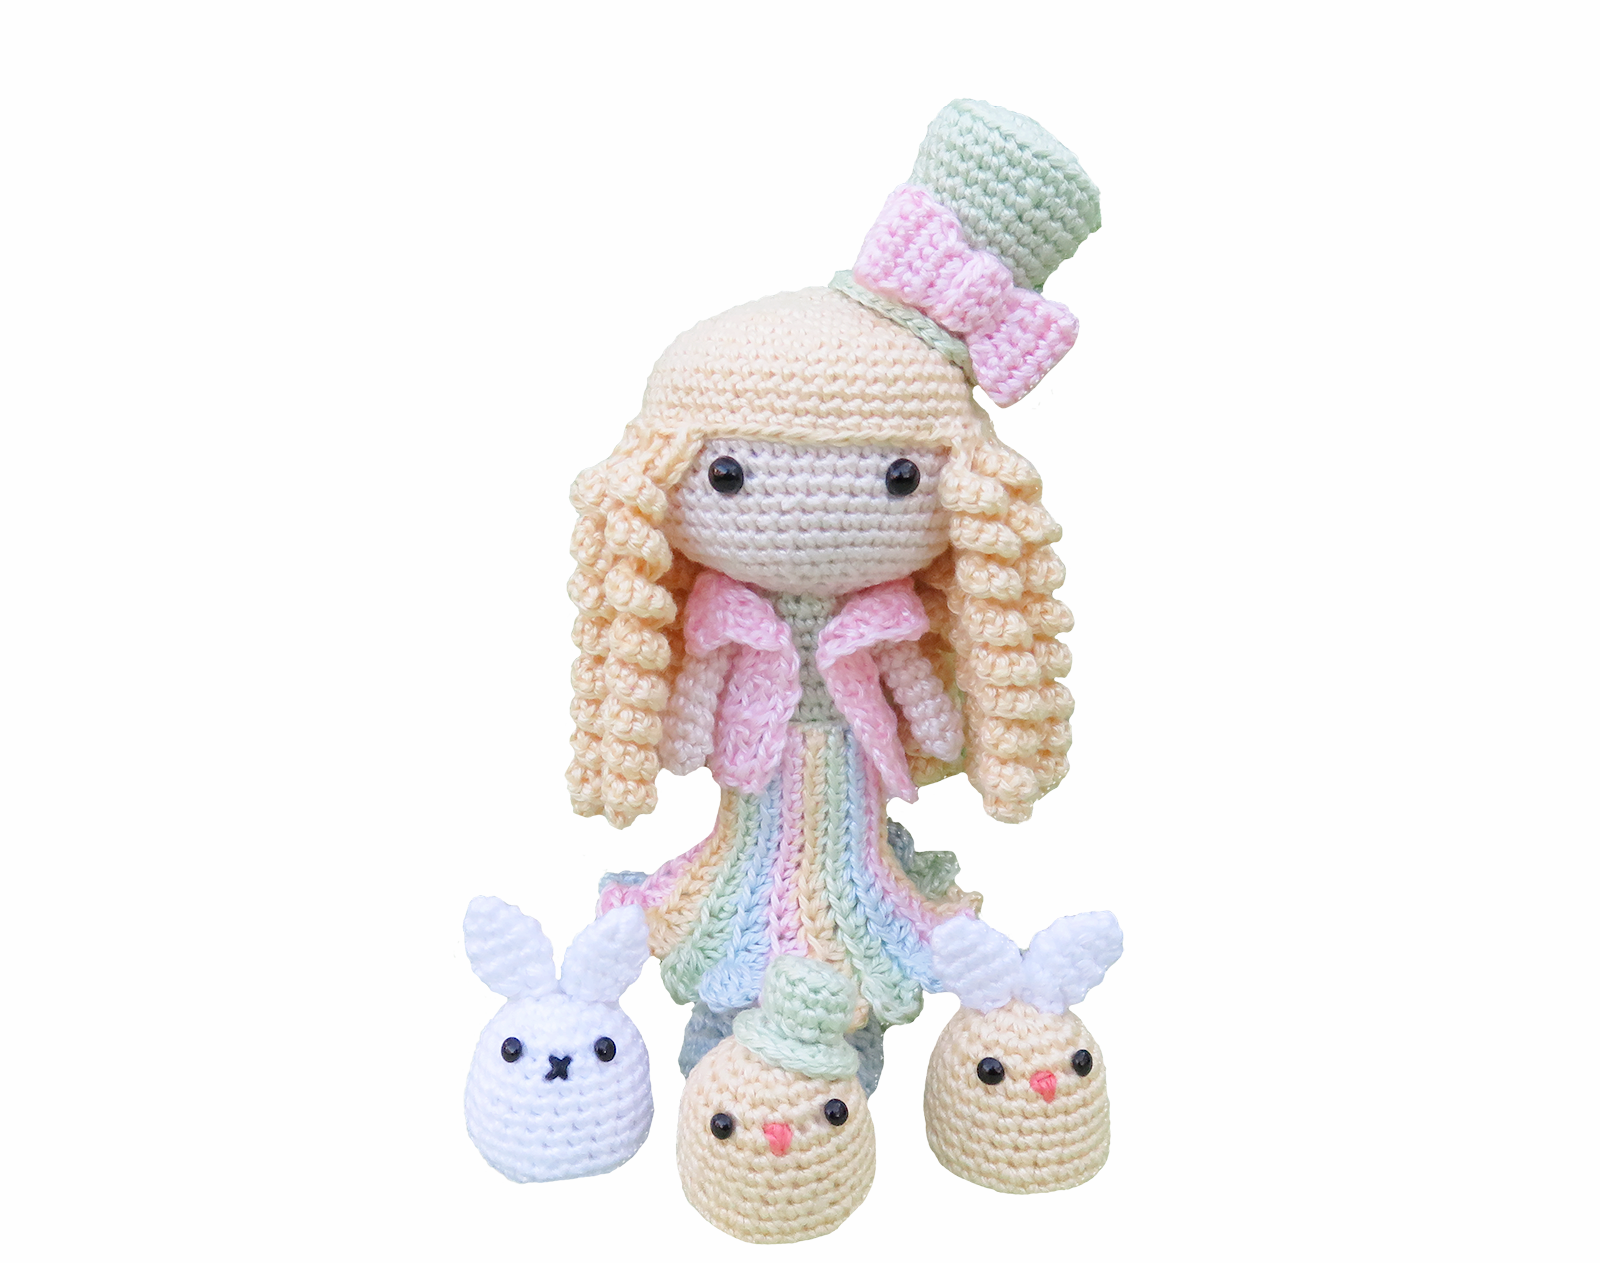 Spring Amigurumi Doll, Crochet Pattern - Sayjai Amigurumi Crochet ...